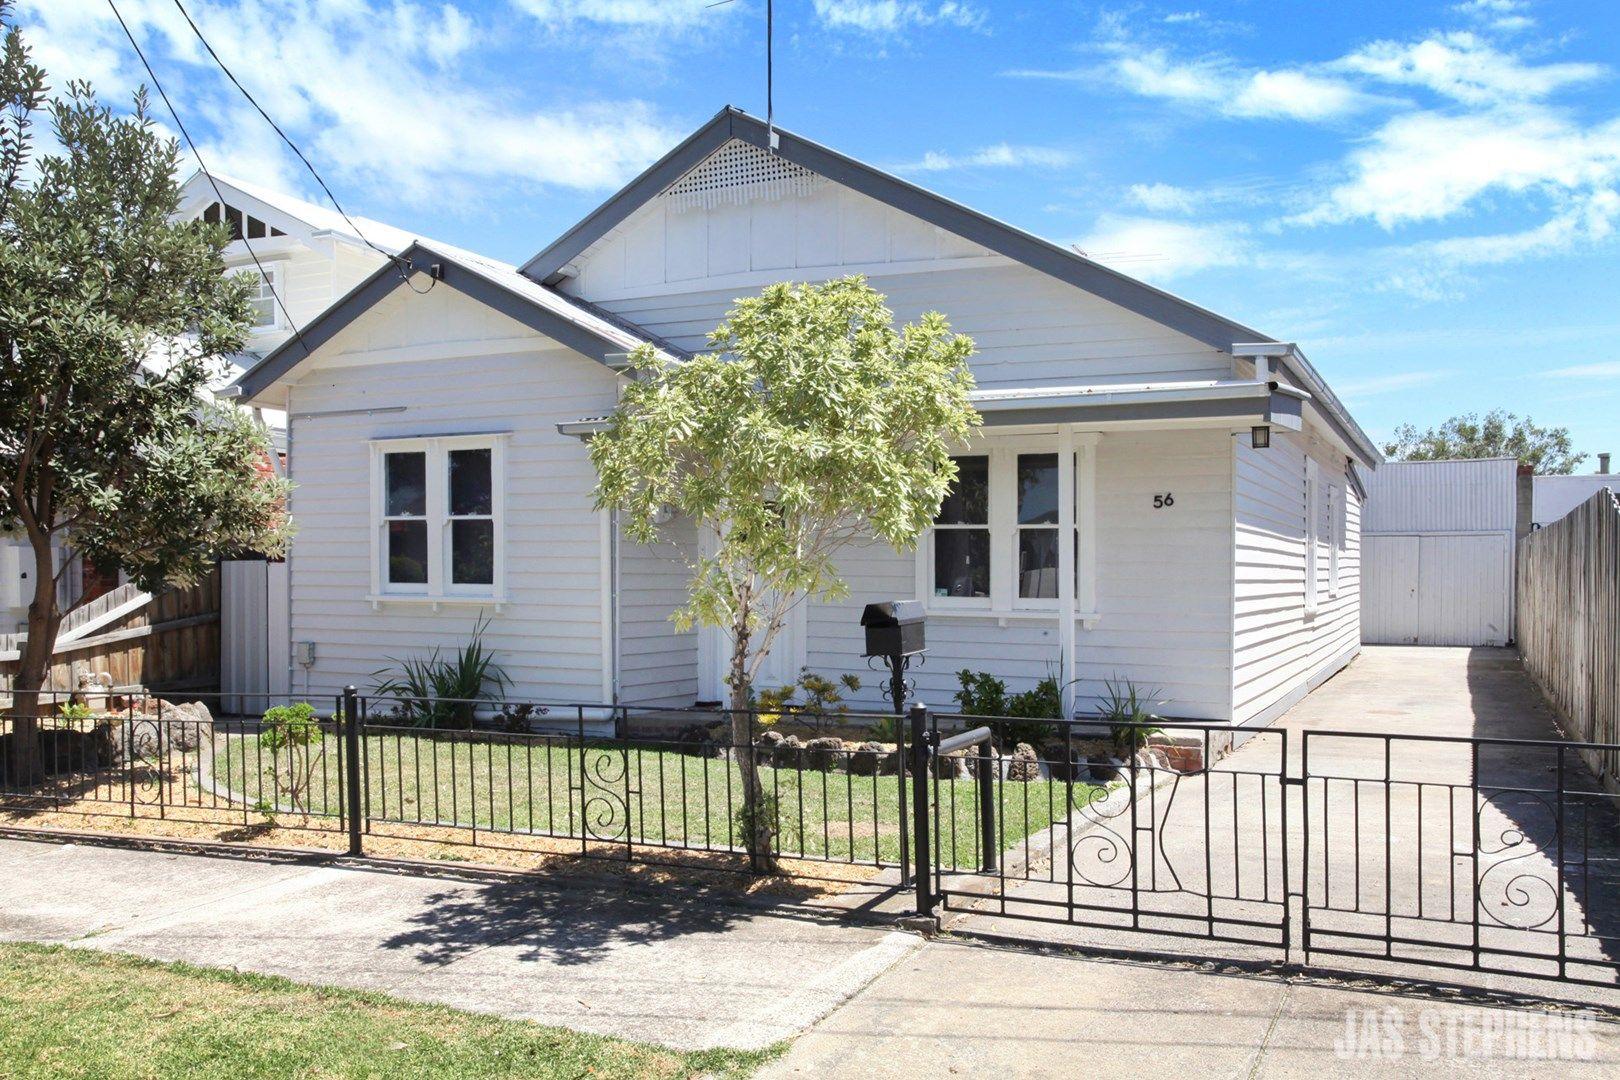 56 Severn Street, Yarraville VIC 3013, Image 0